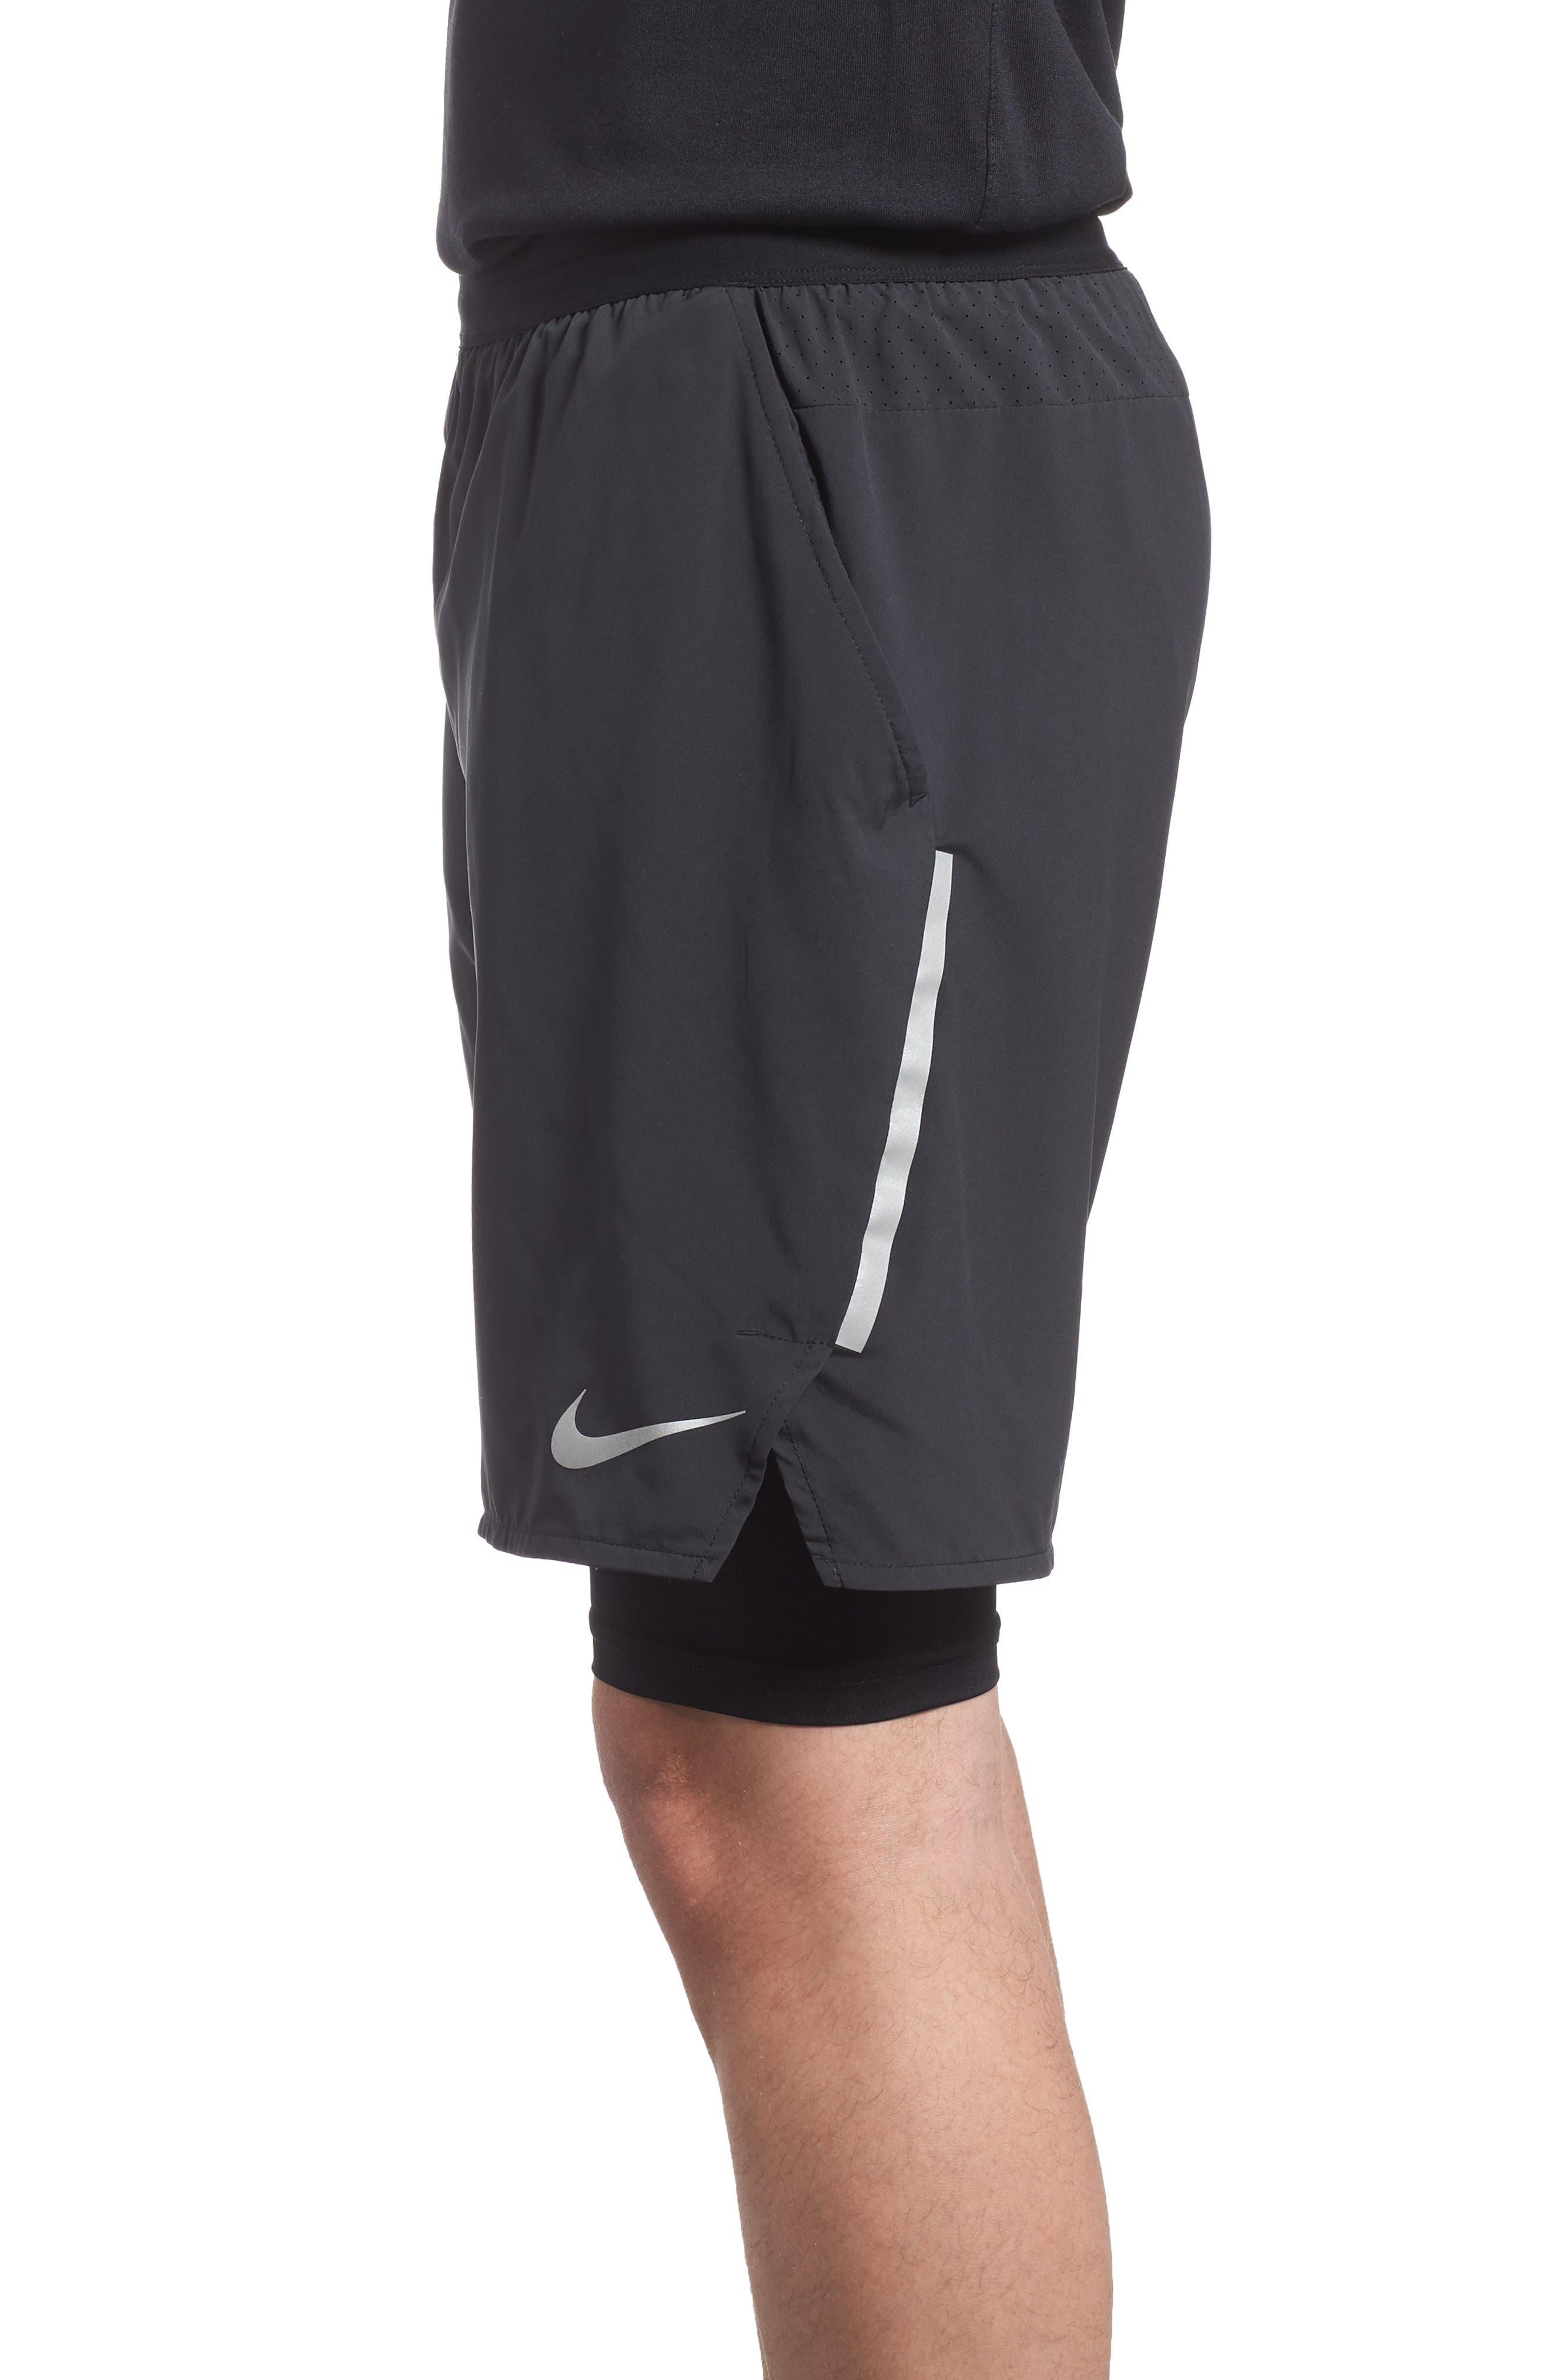 Flex Distance Running Shorts,                             Alternate thumbnail 3, color,                             Black/ Black